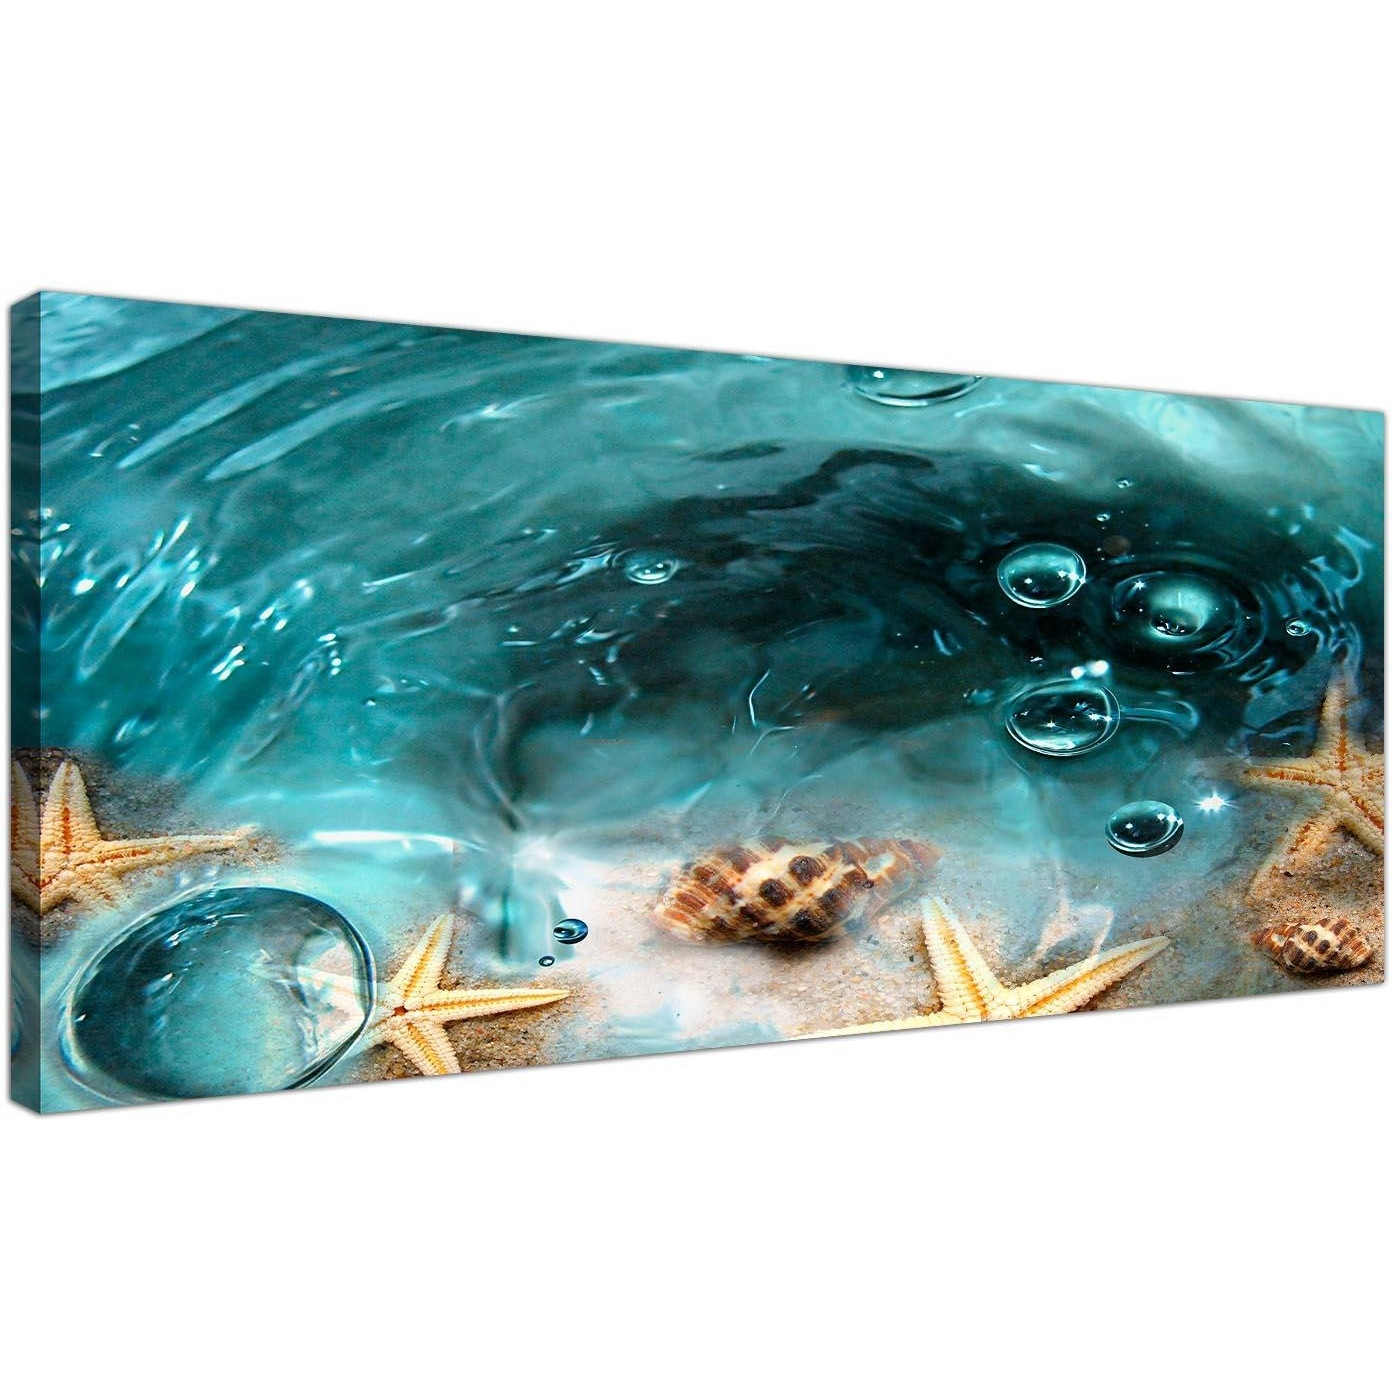 Teal Seaside Starfish In Sand Bathroom Wall Art With Bathroom Canvas Wall Art (View 13 of 20)